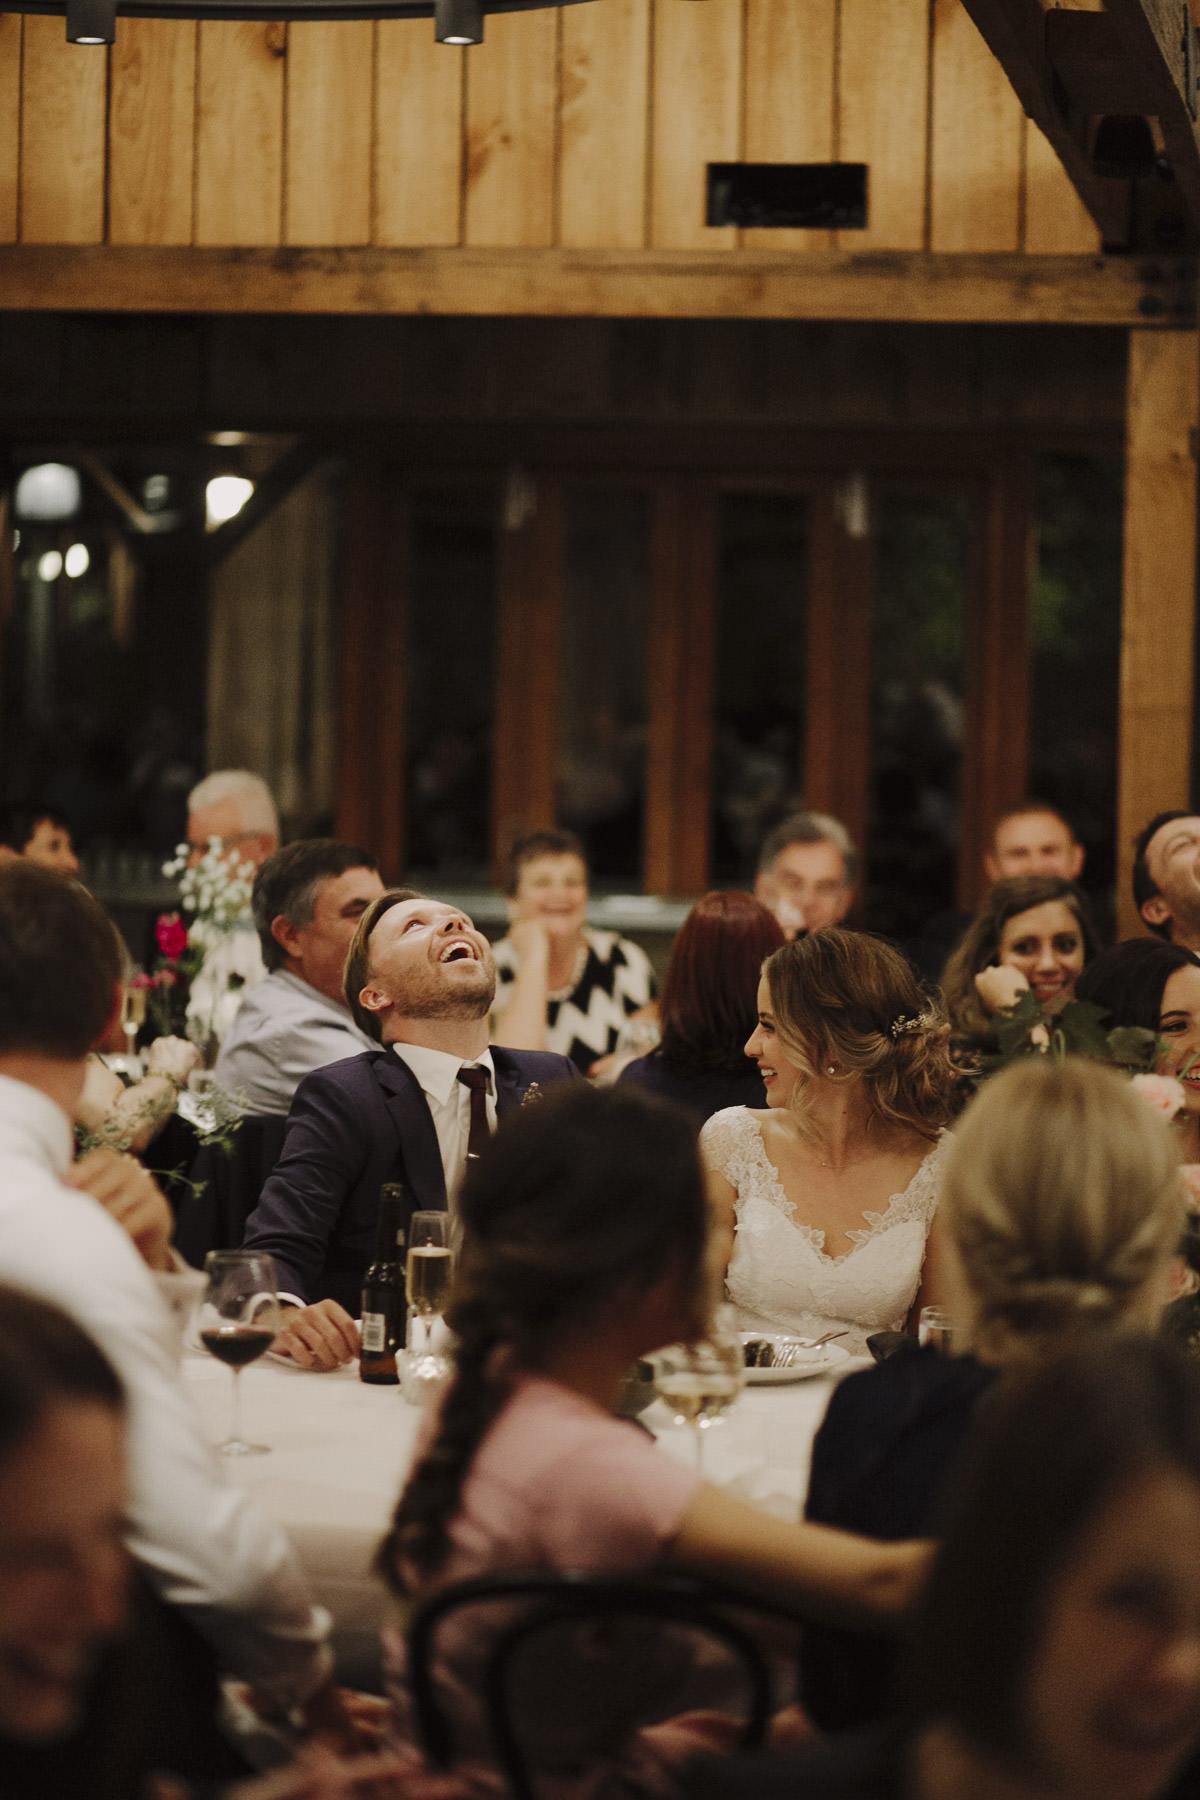 160506_justinaaron_wedding_holly_daniel_pr-290.jpg